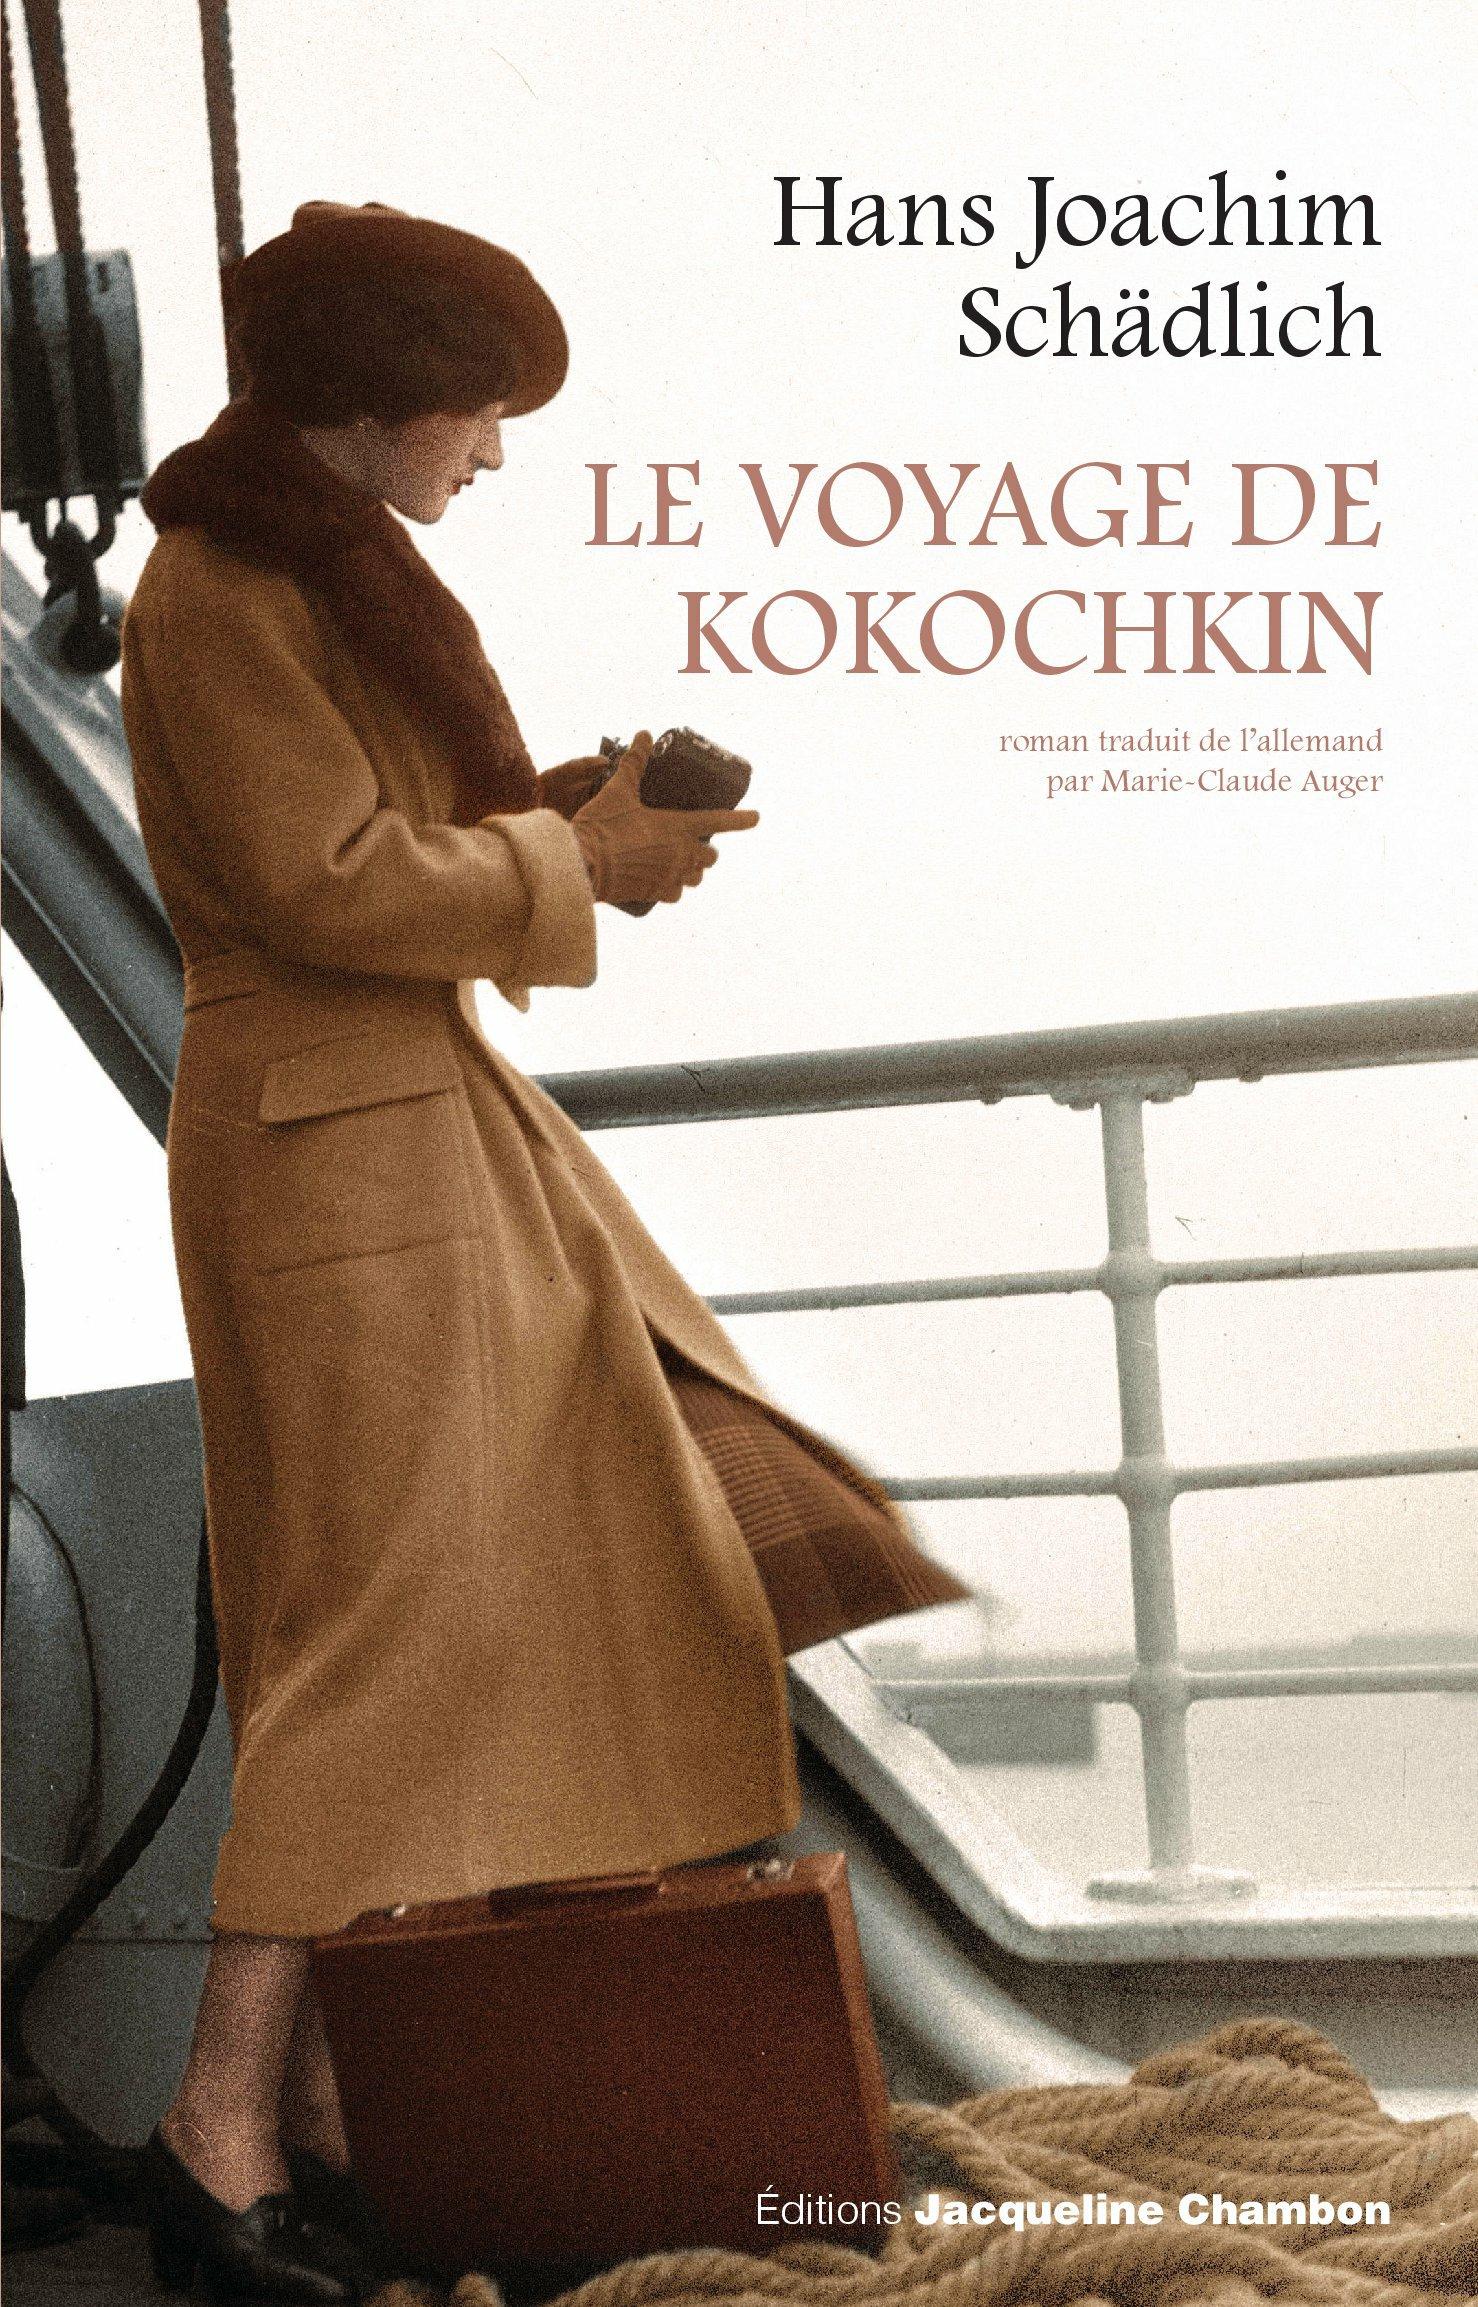 Le Voyage de Kokochkin | Schadlich, Hans joachim